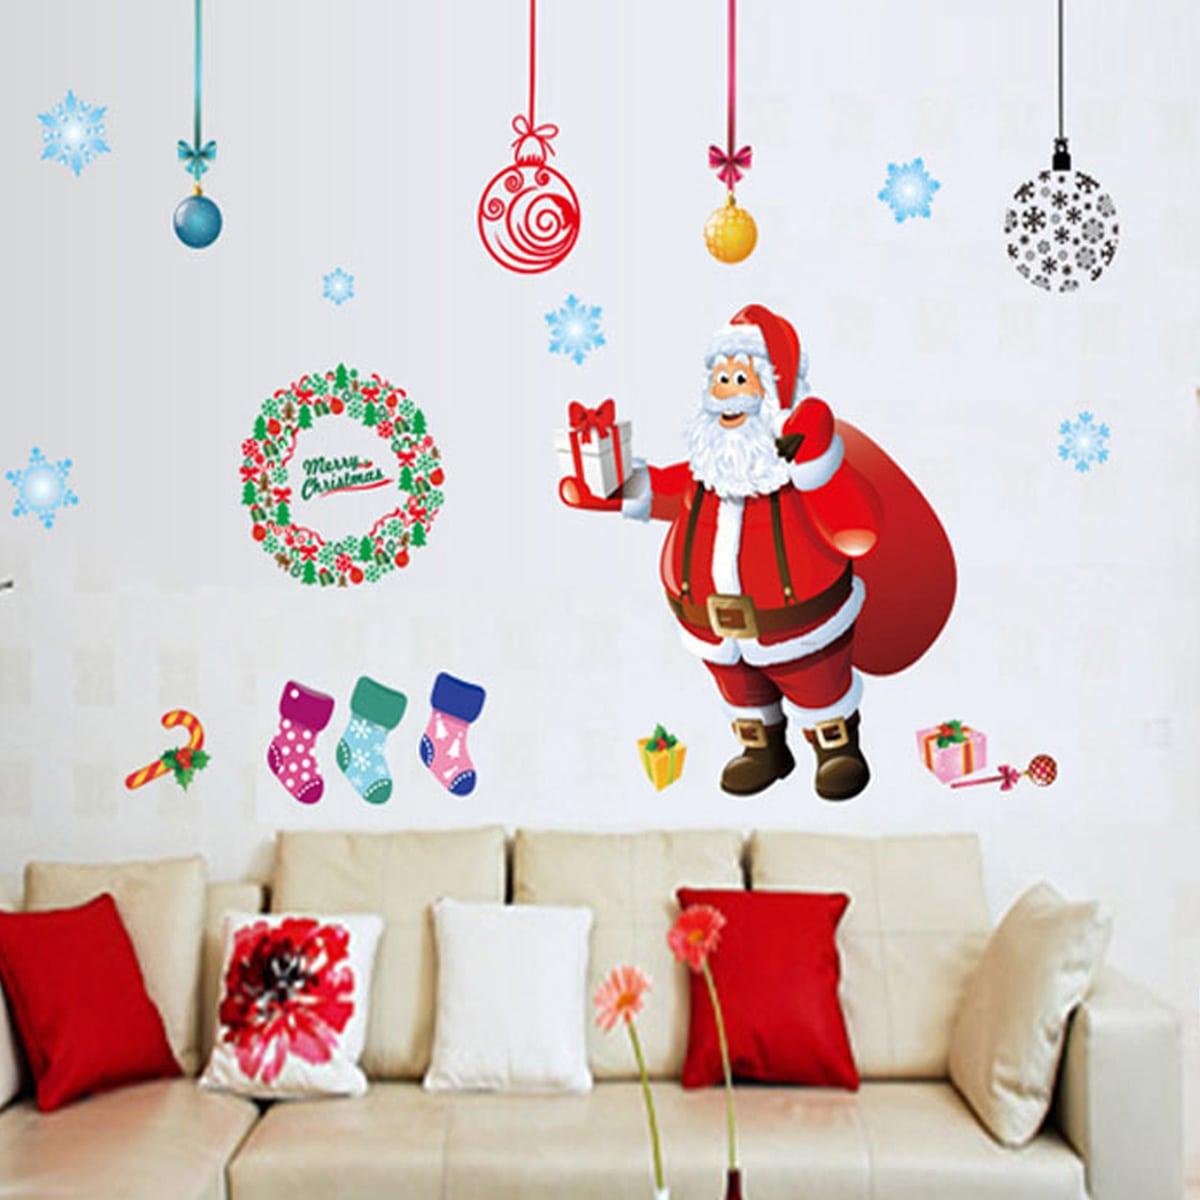 Muursticker kerstman print